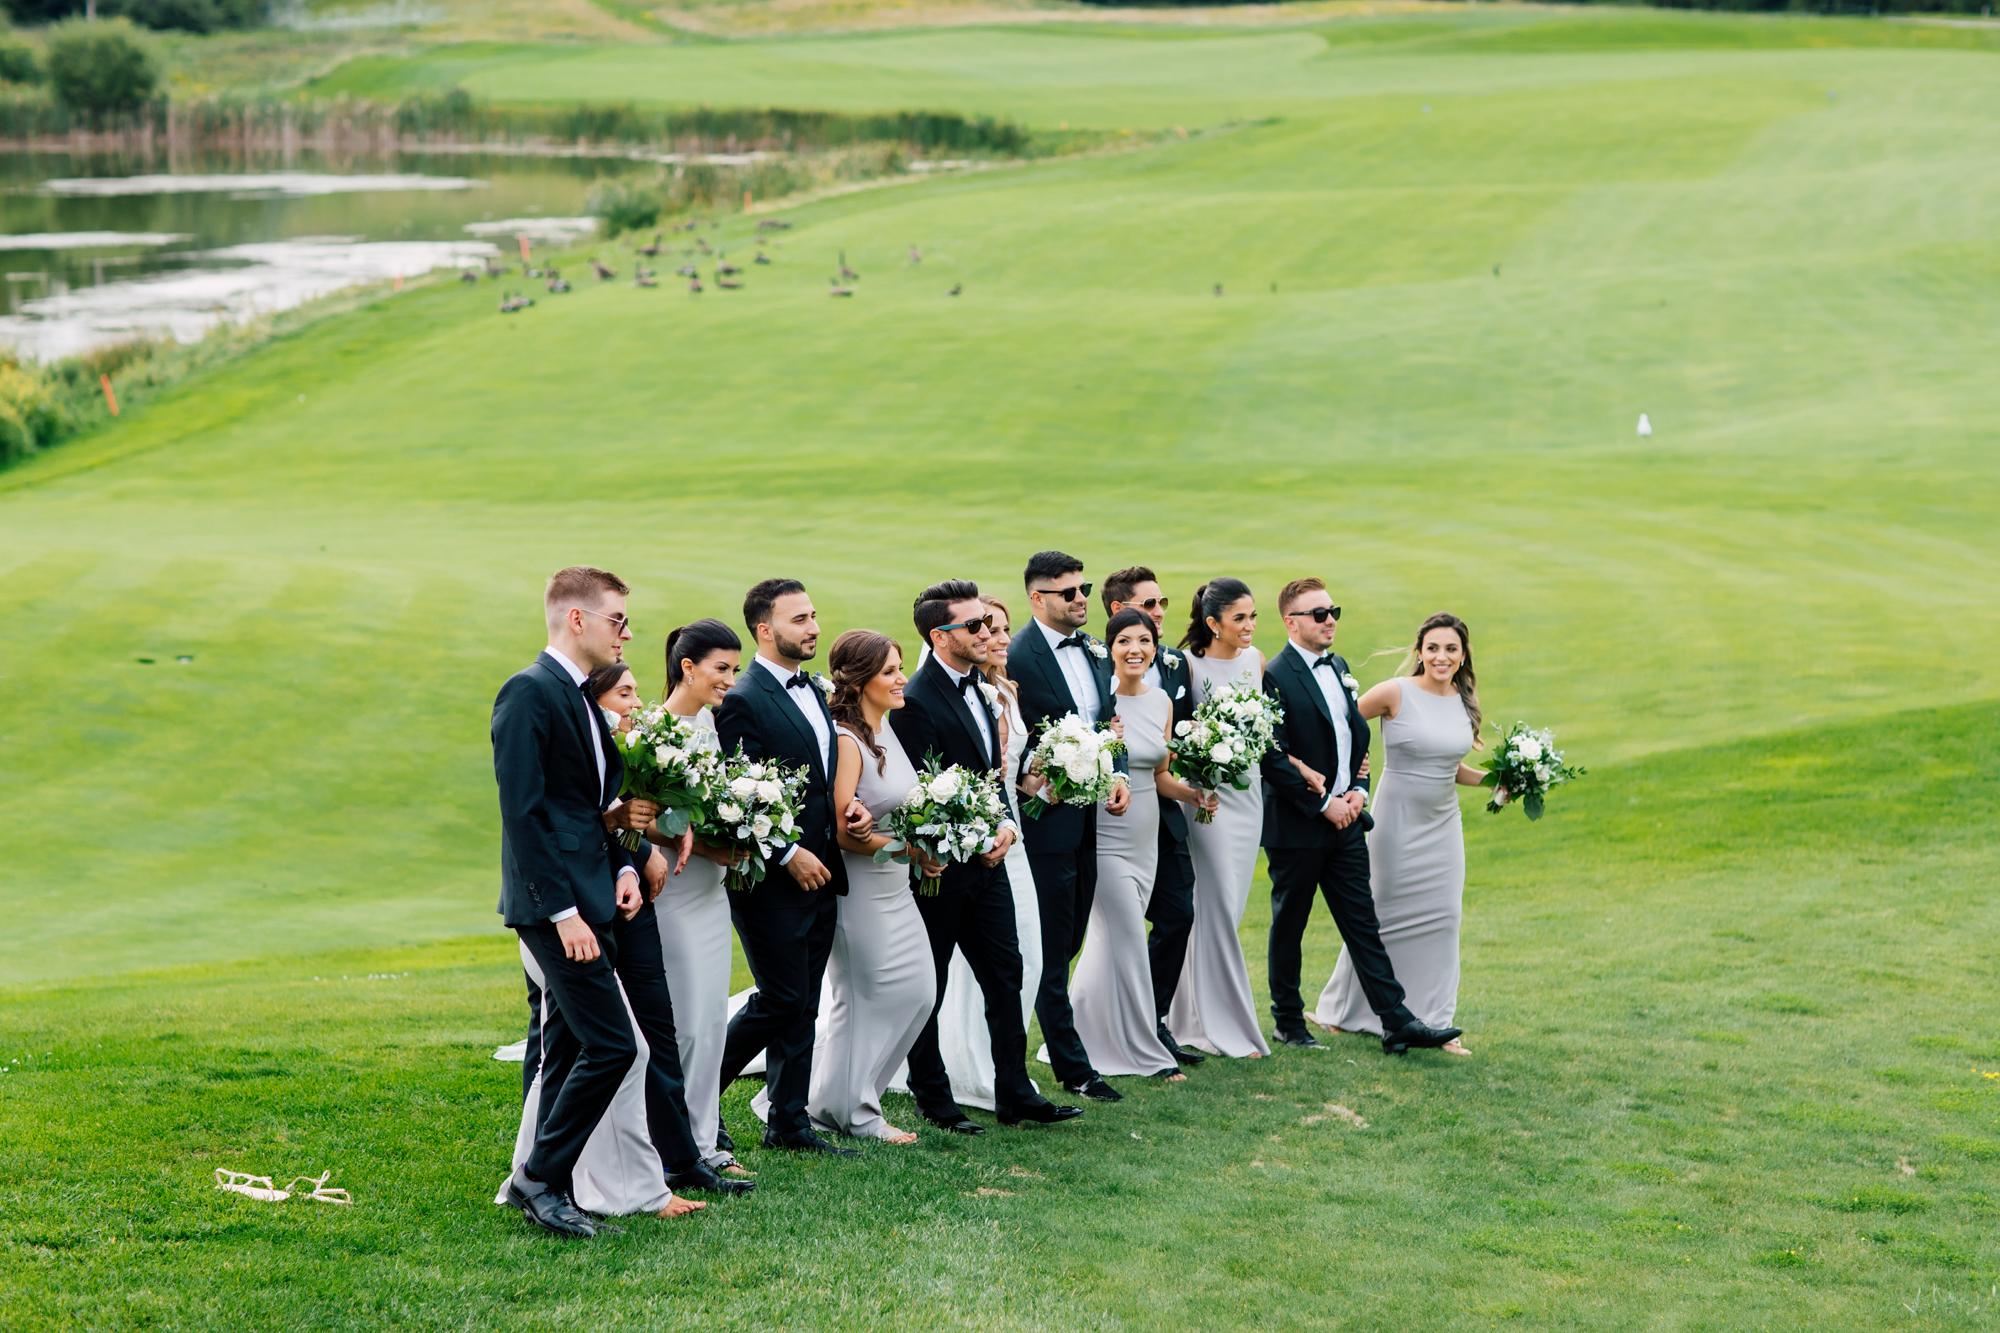 golf course bridal party